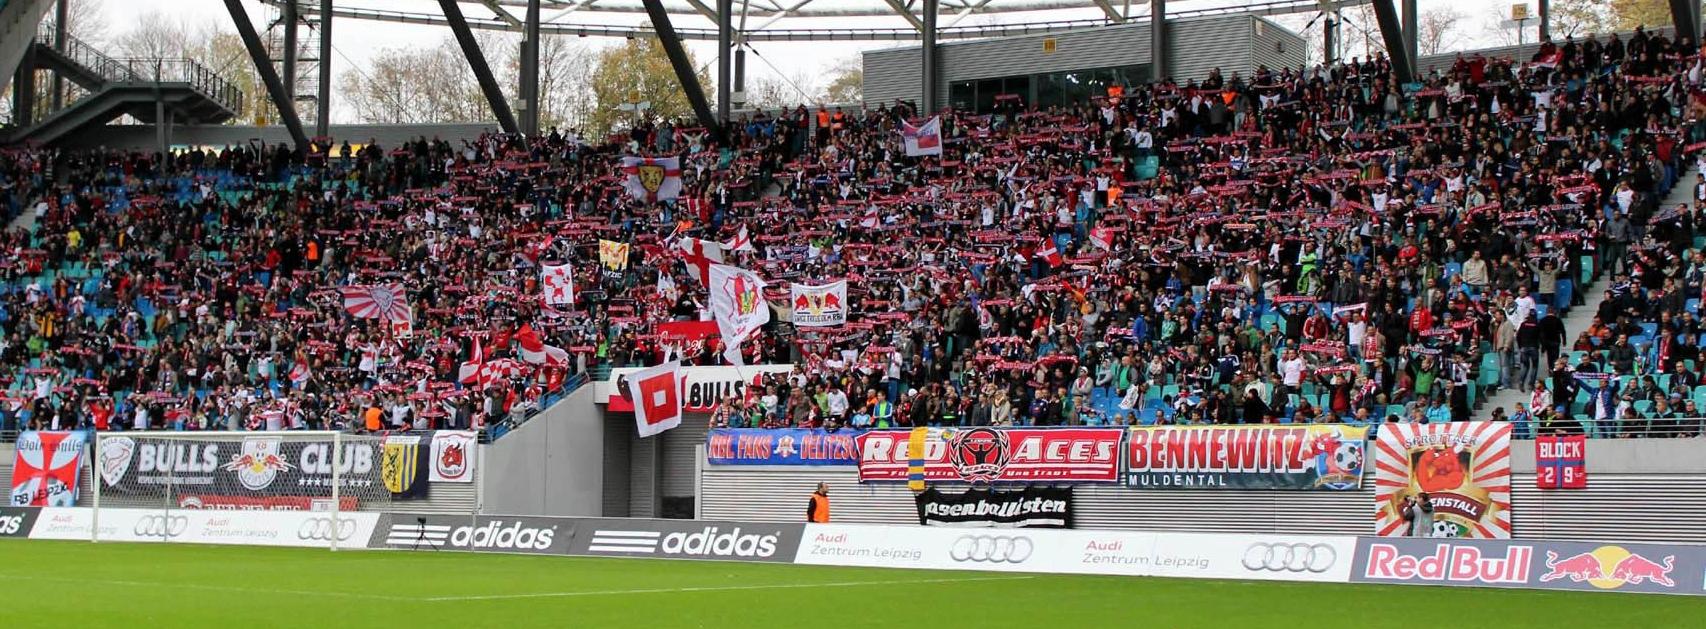 15 Spieltag_RBL-BVBII